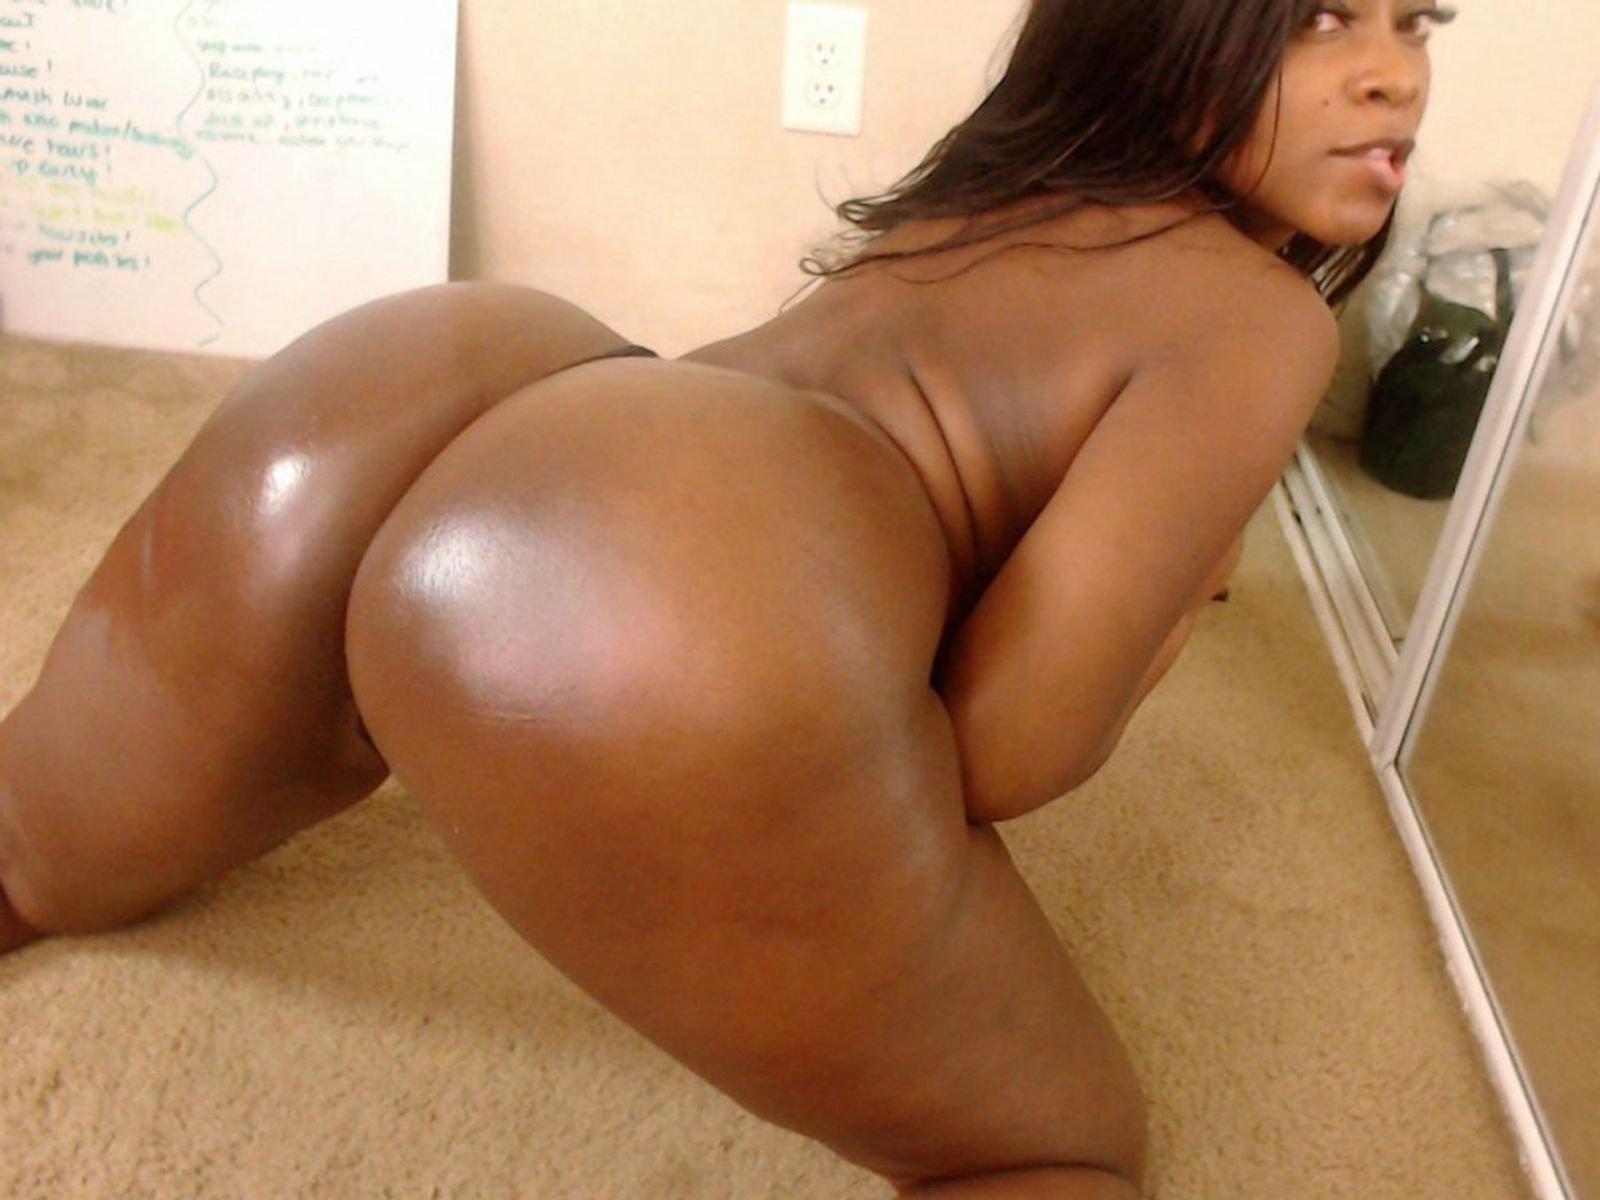 Housewife secret web cam